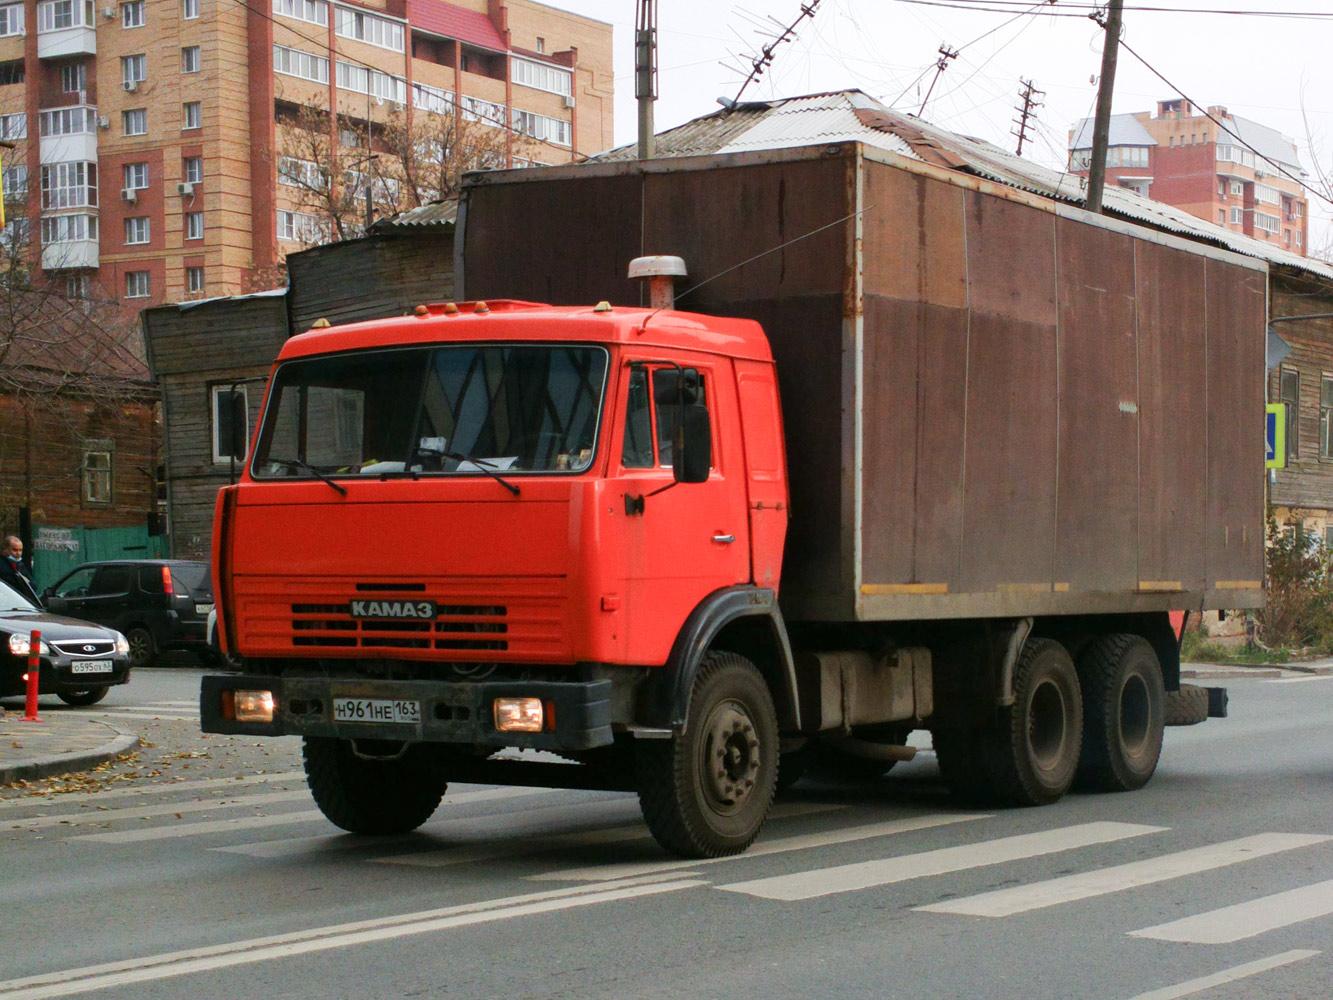 Фургон на шасси КамАЗ-5320 #Н961НЕ163. г. Самара, ул. Вилоновская